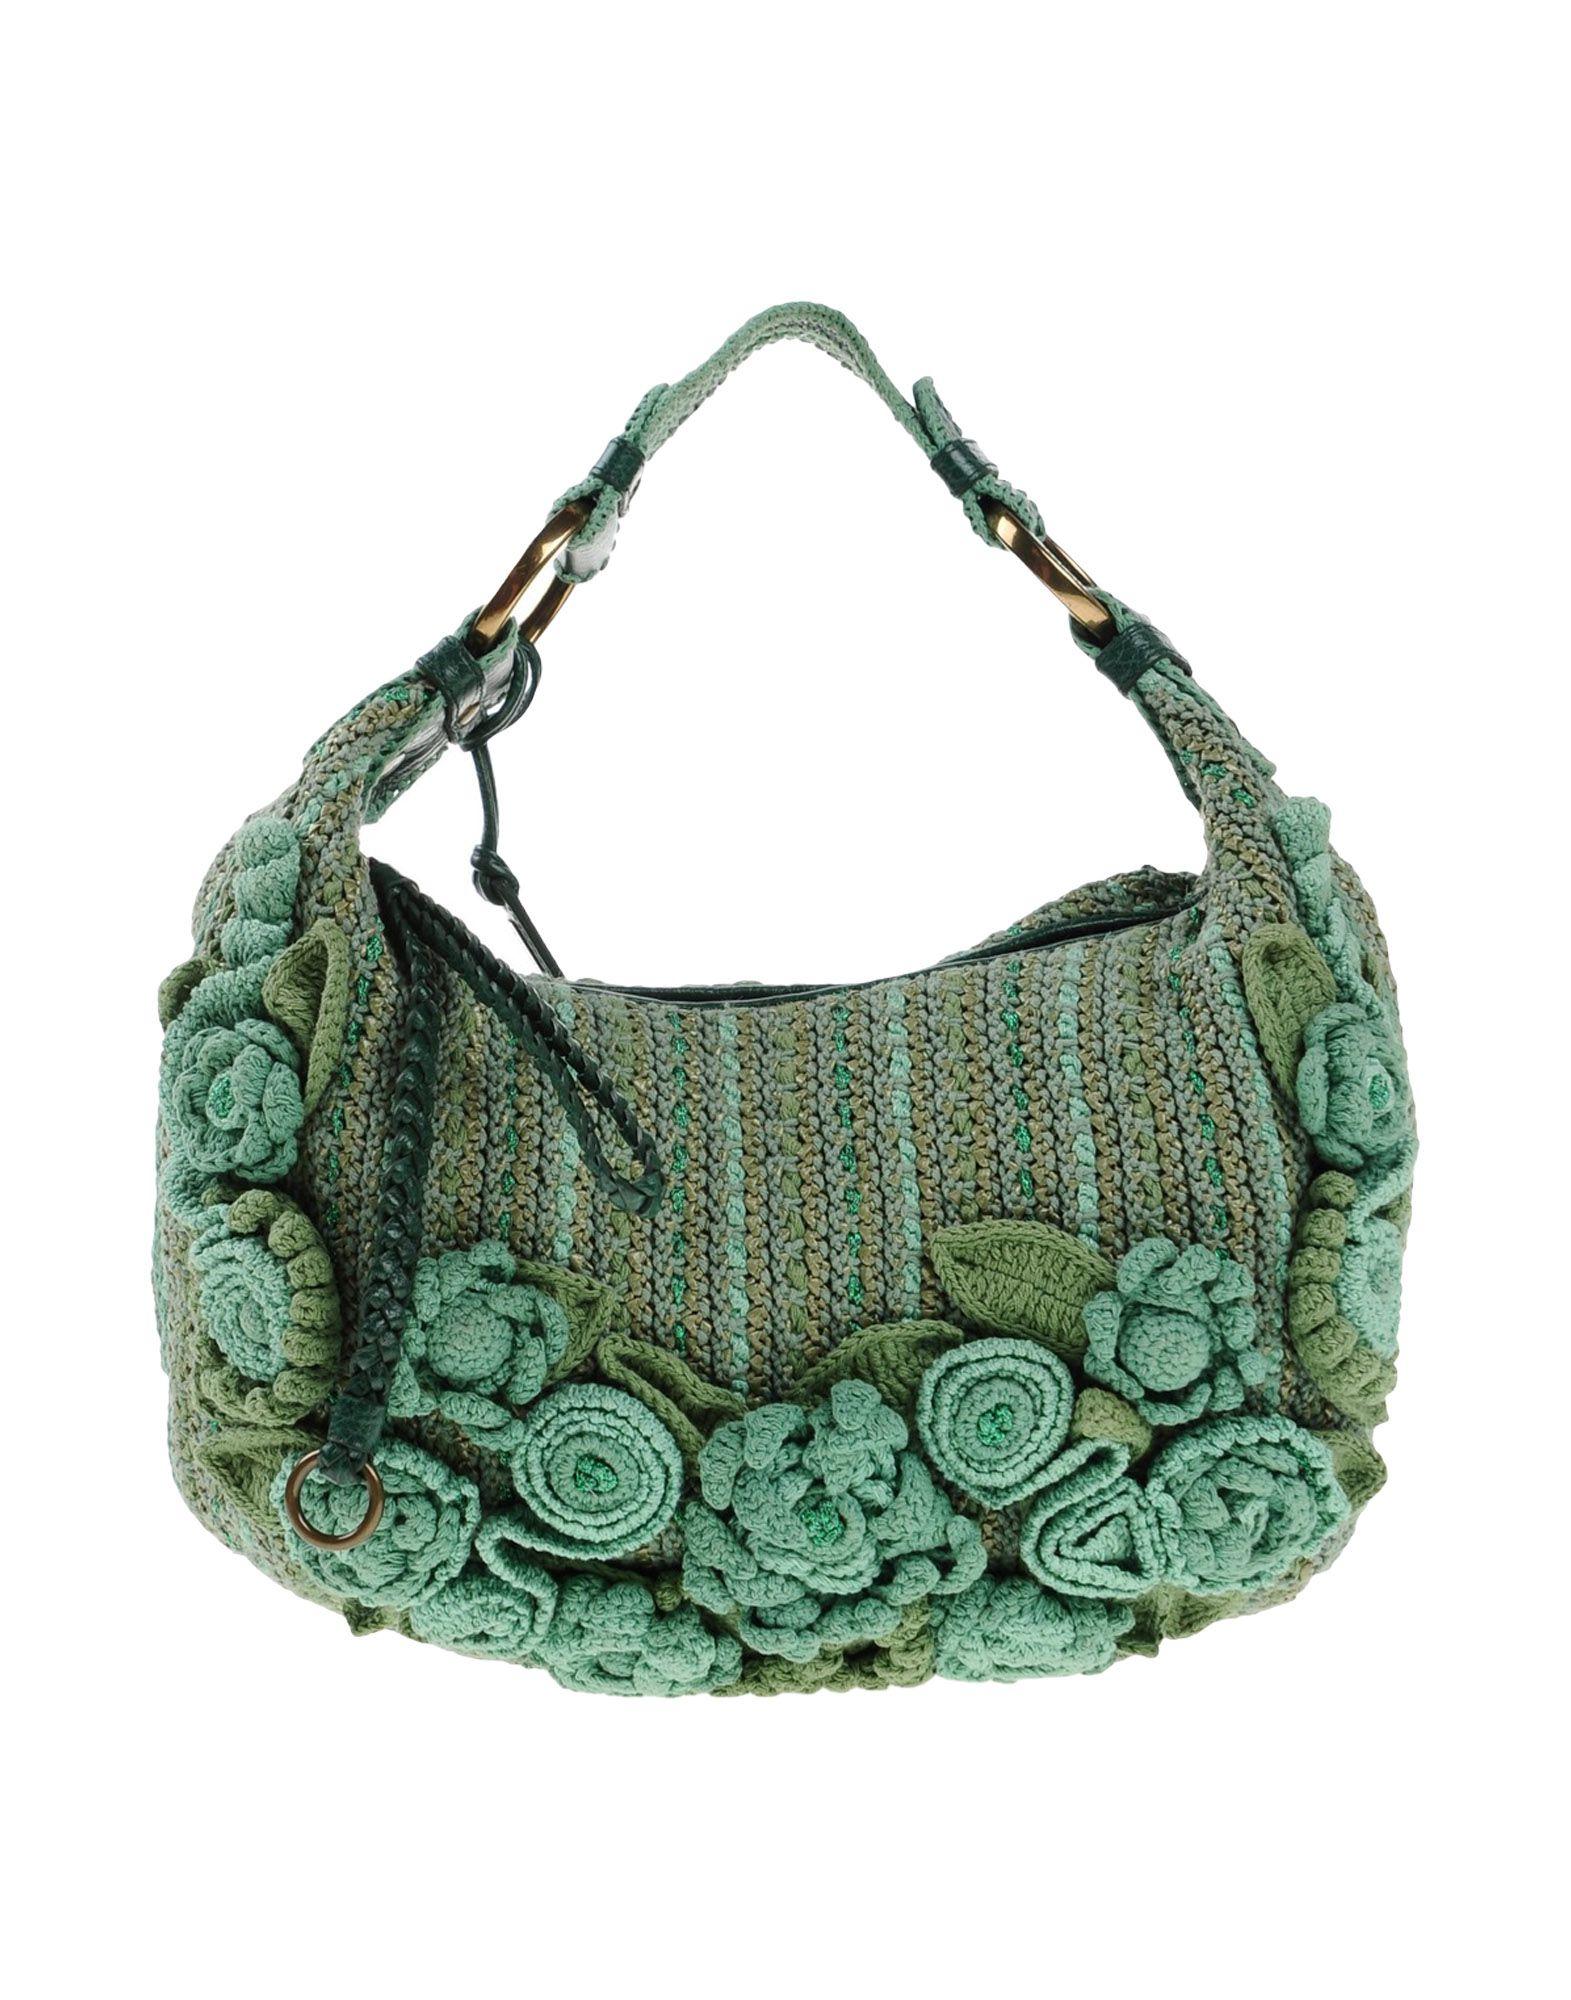 a6546a76ff Lyst - Isabella Fiore Handbag in Green